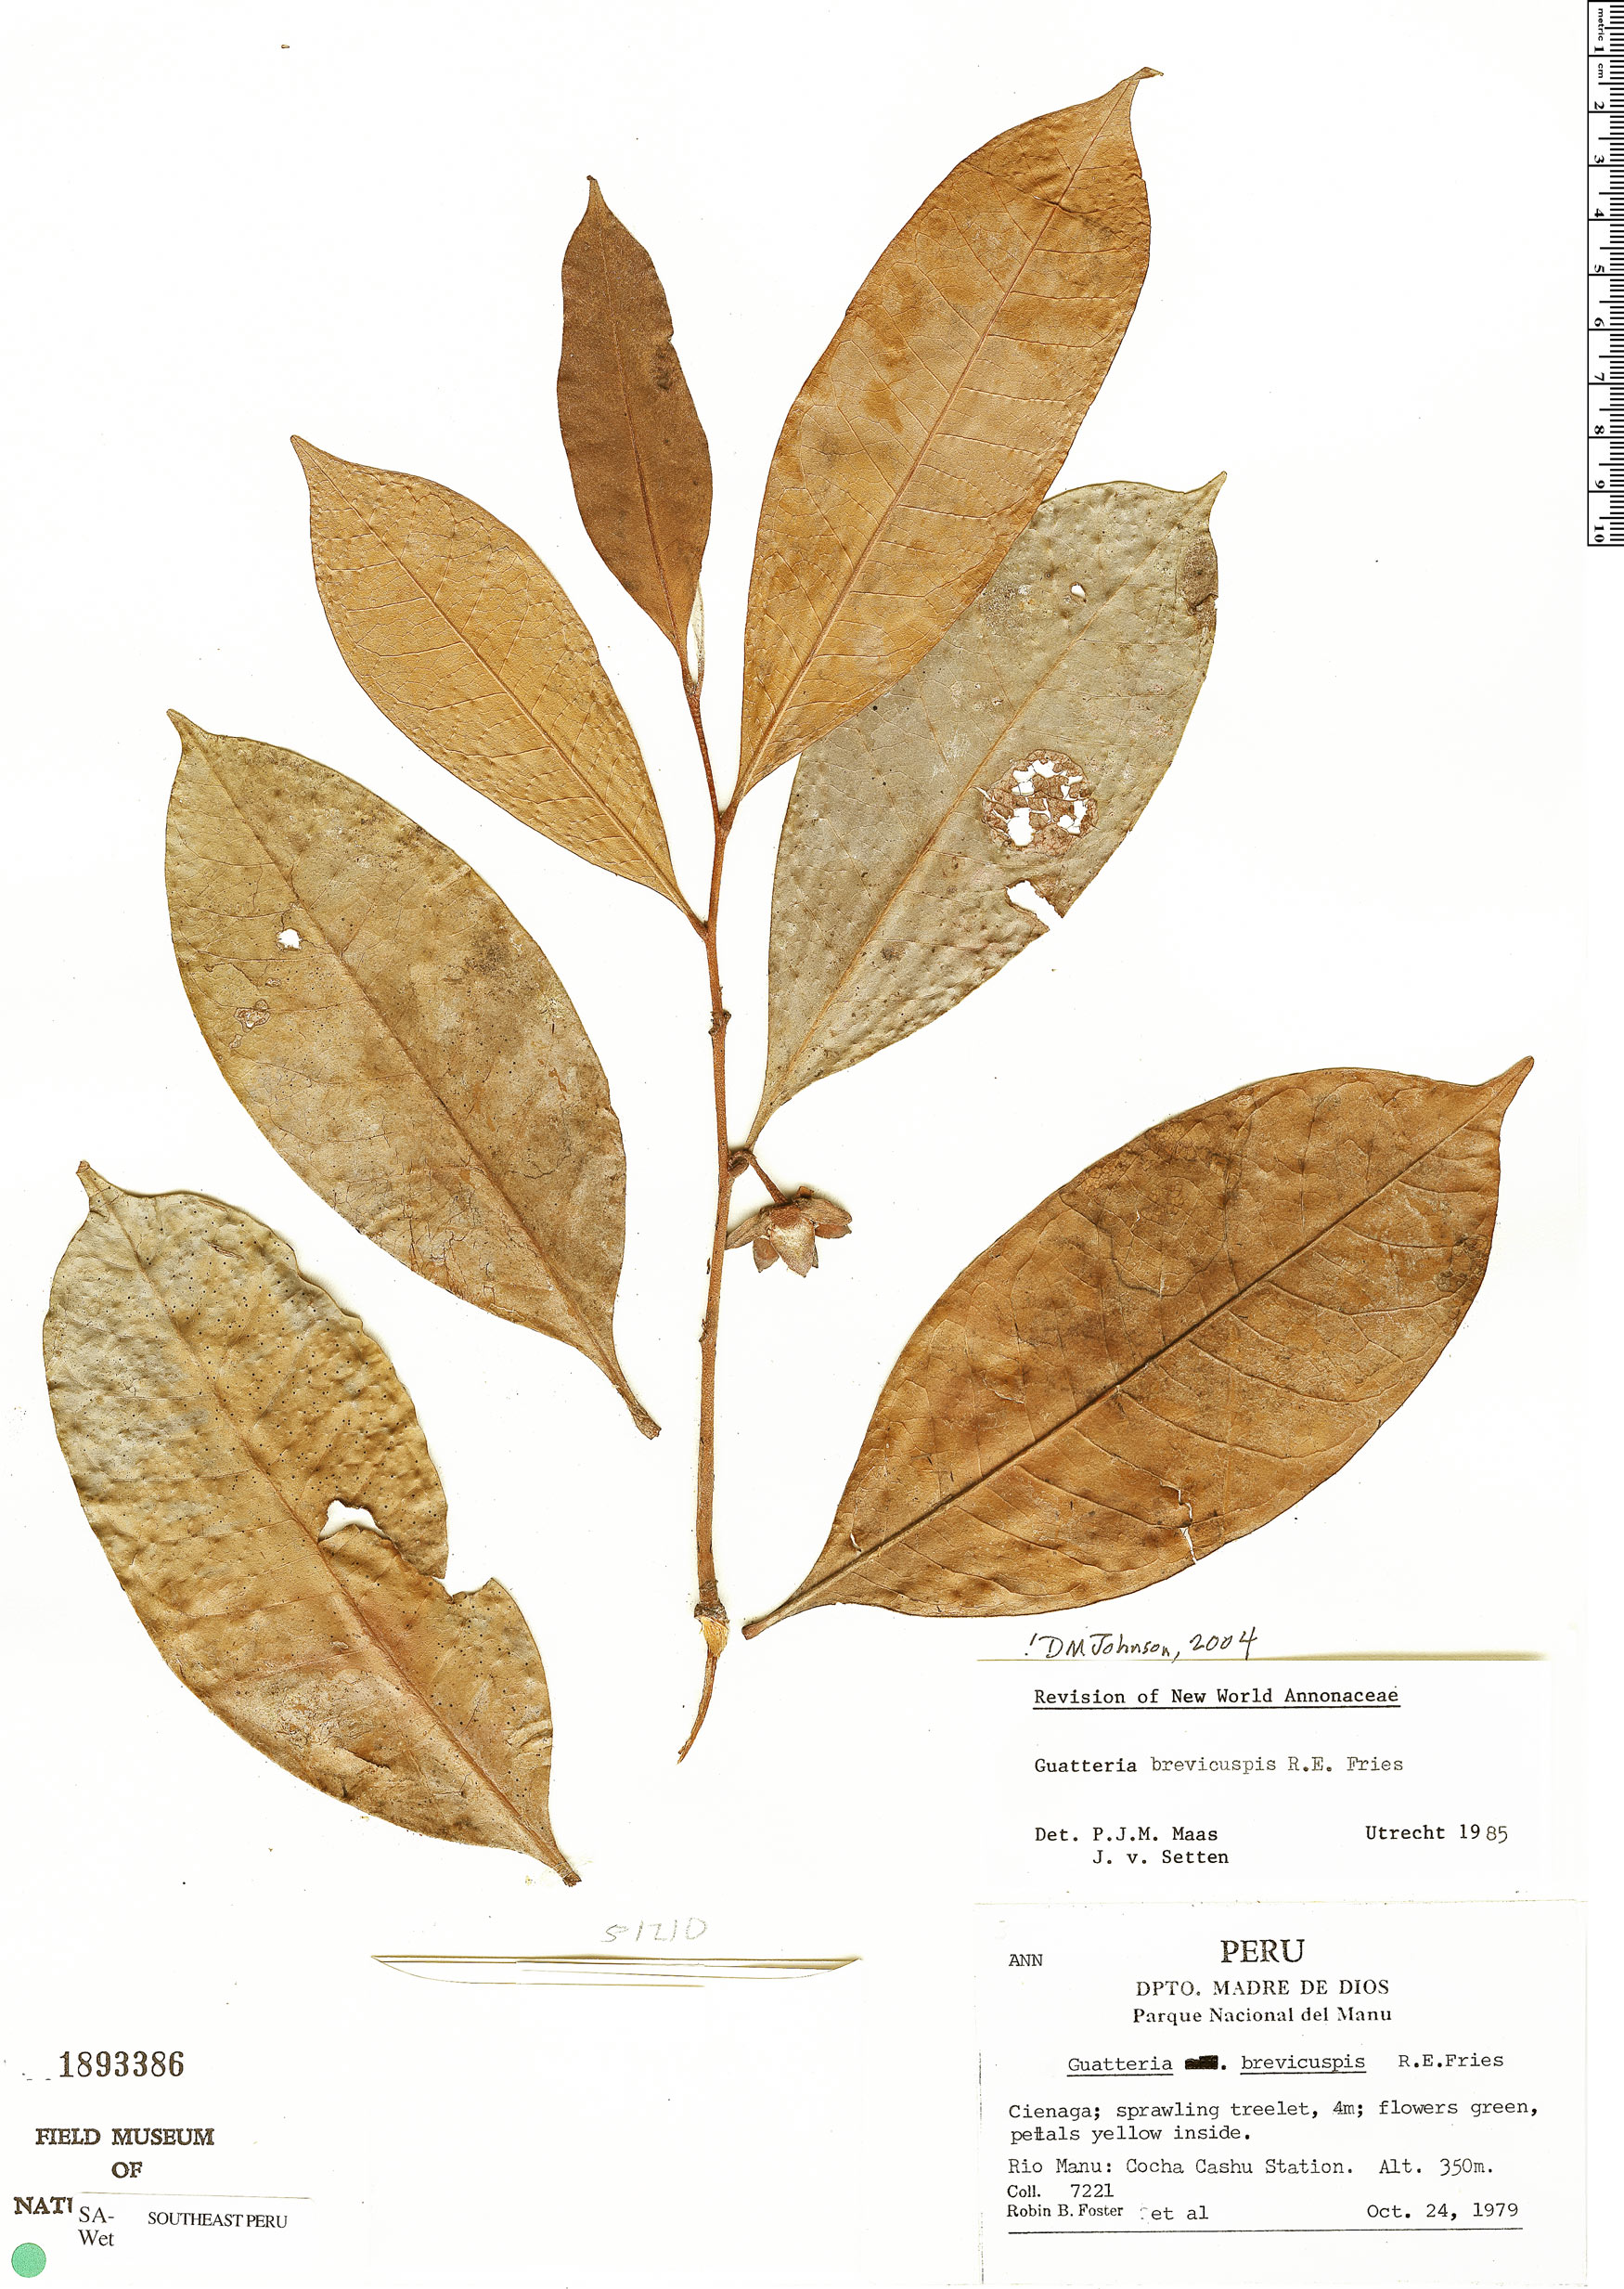 Espécime: Guatteria blepharophylla